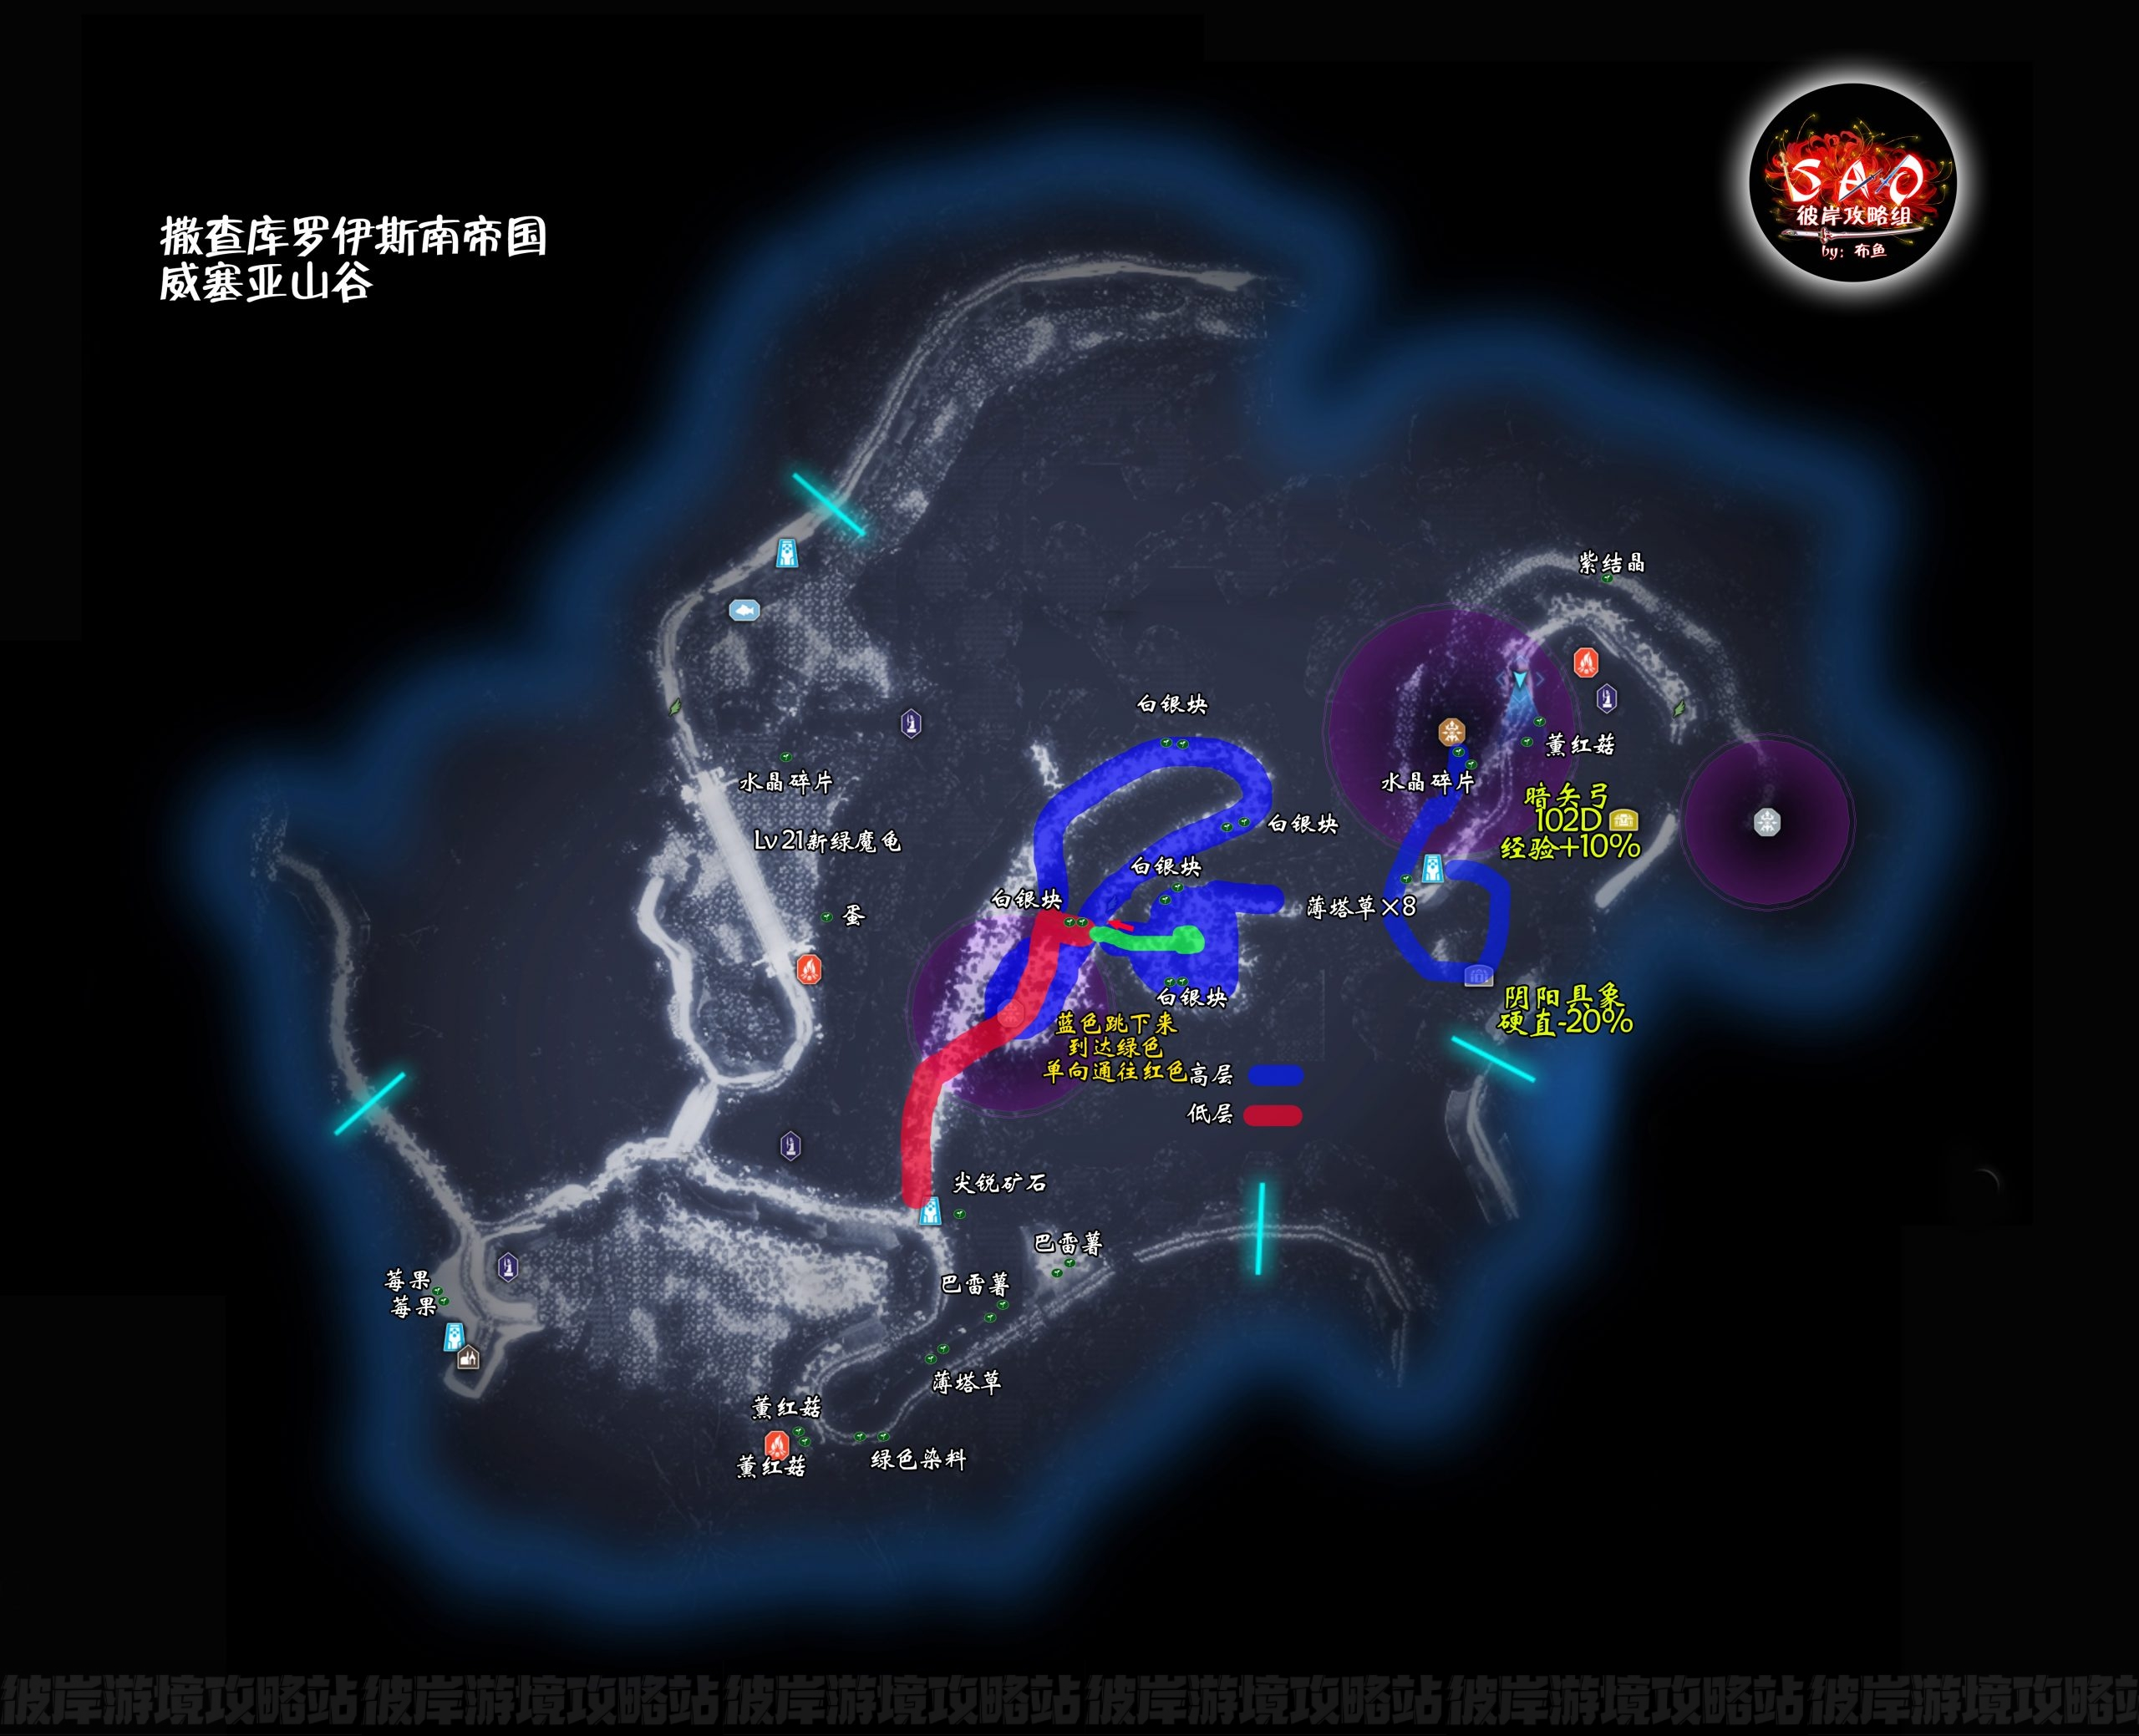 【SAOAL攻略组】超完全流程地图攻略及新手指引-威塞亚山谷篇-刀剑神域彼岸游境攻略站